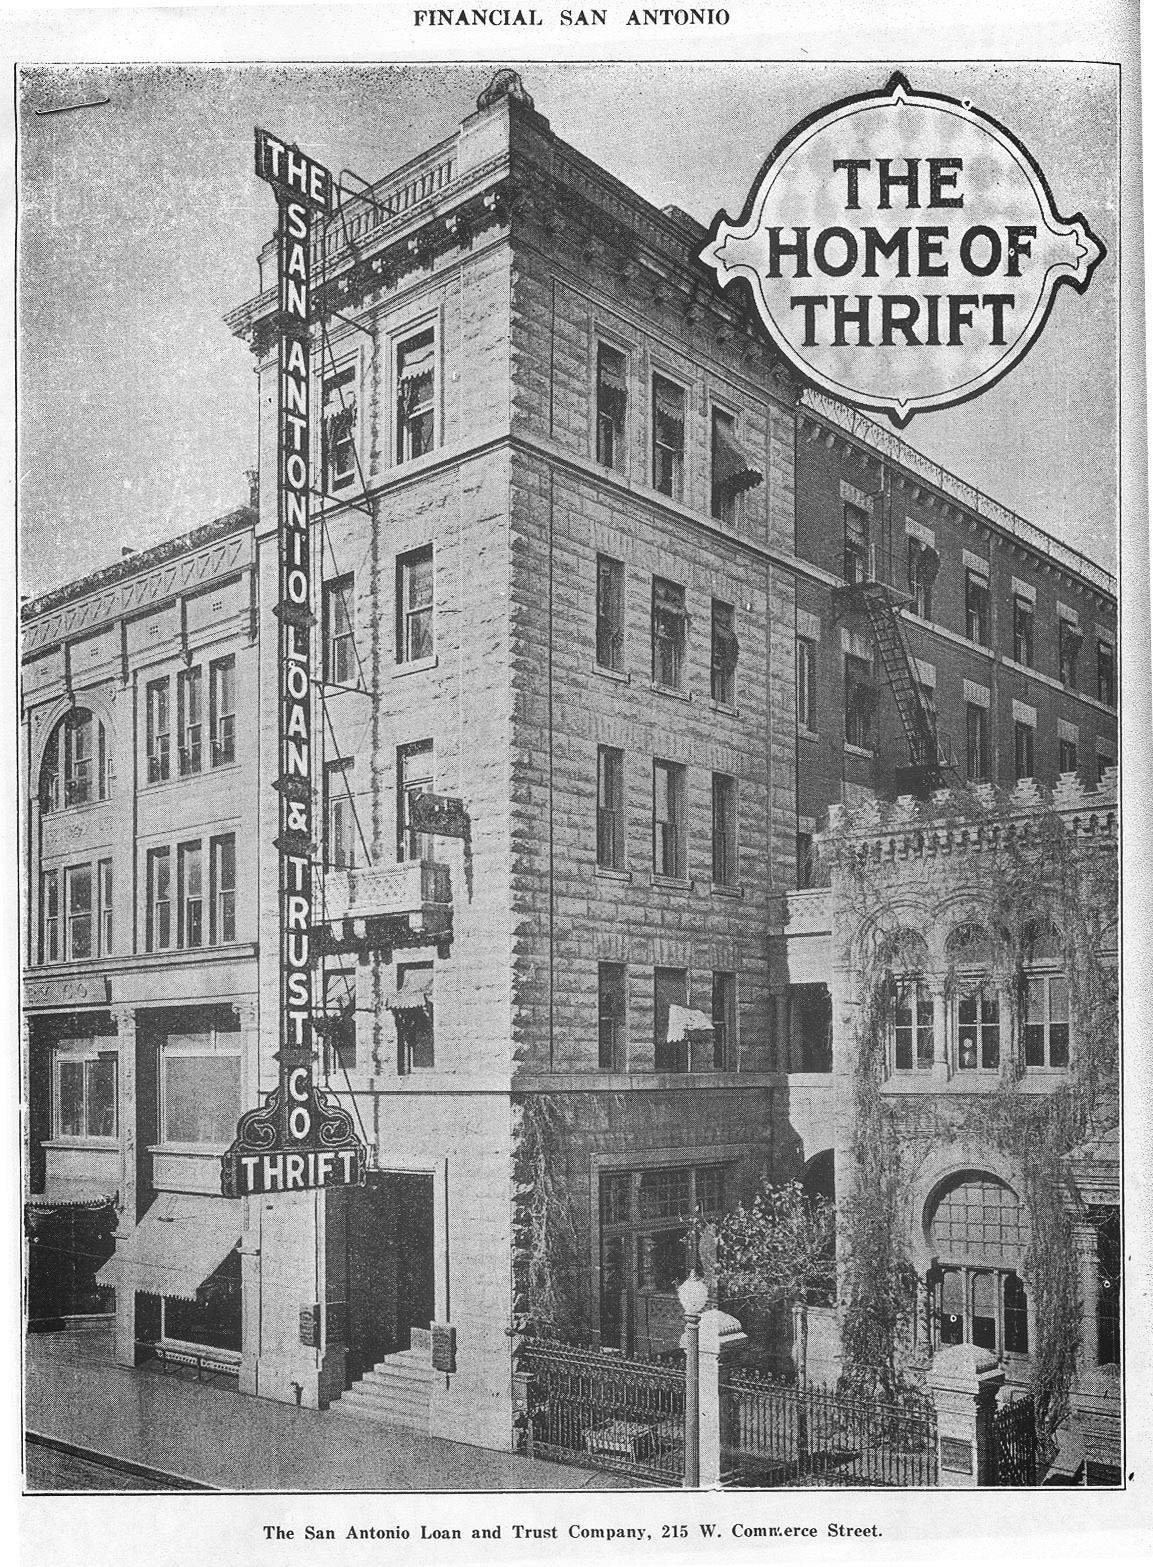 Old San Antonio Loan & Trust - Hist. Photo.jpg